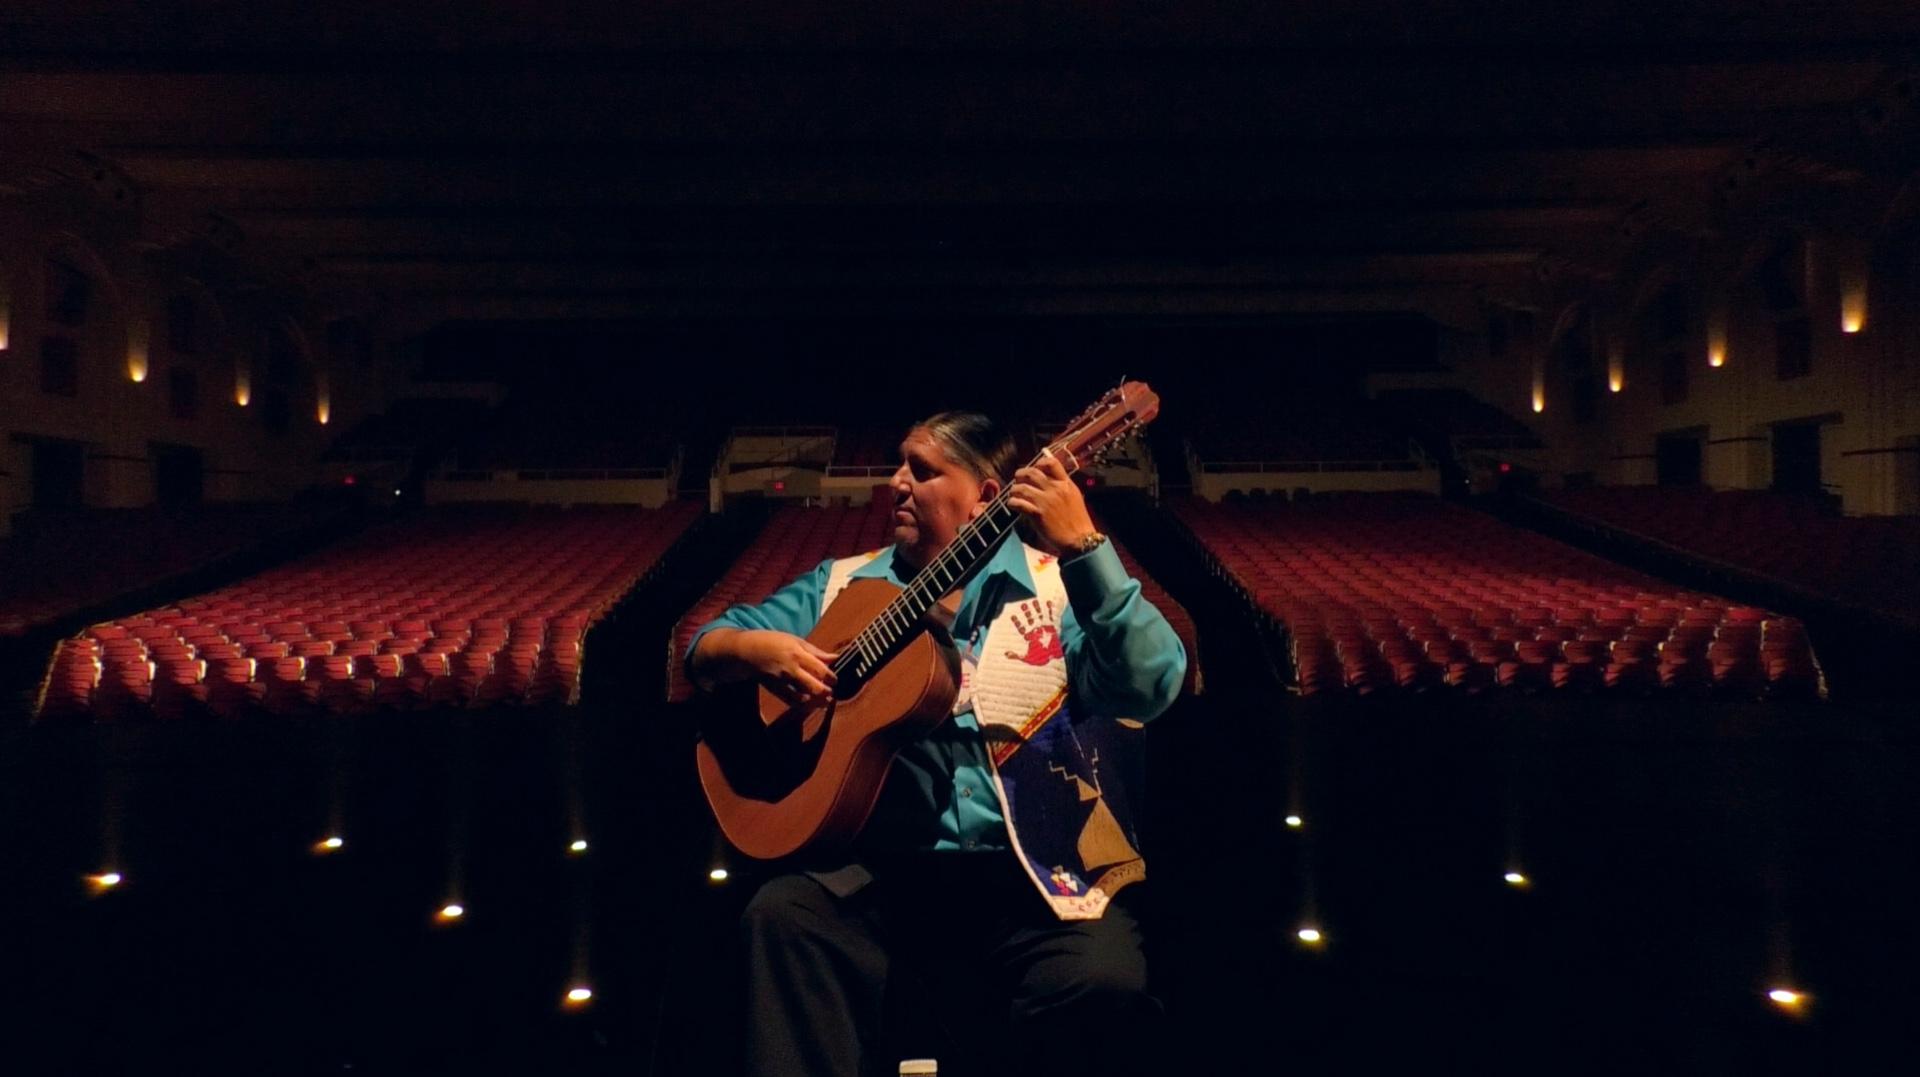 The Tucson Studio Concert Series